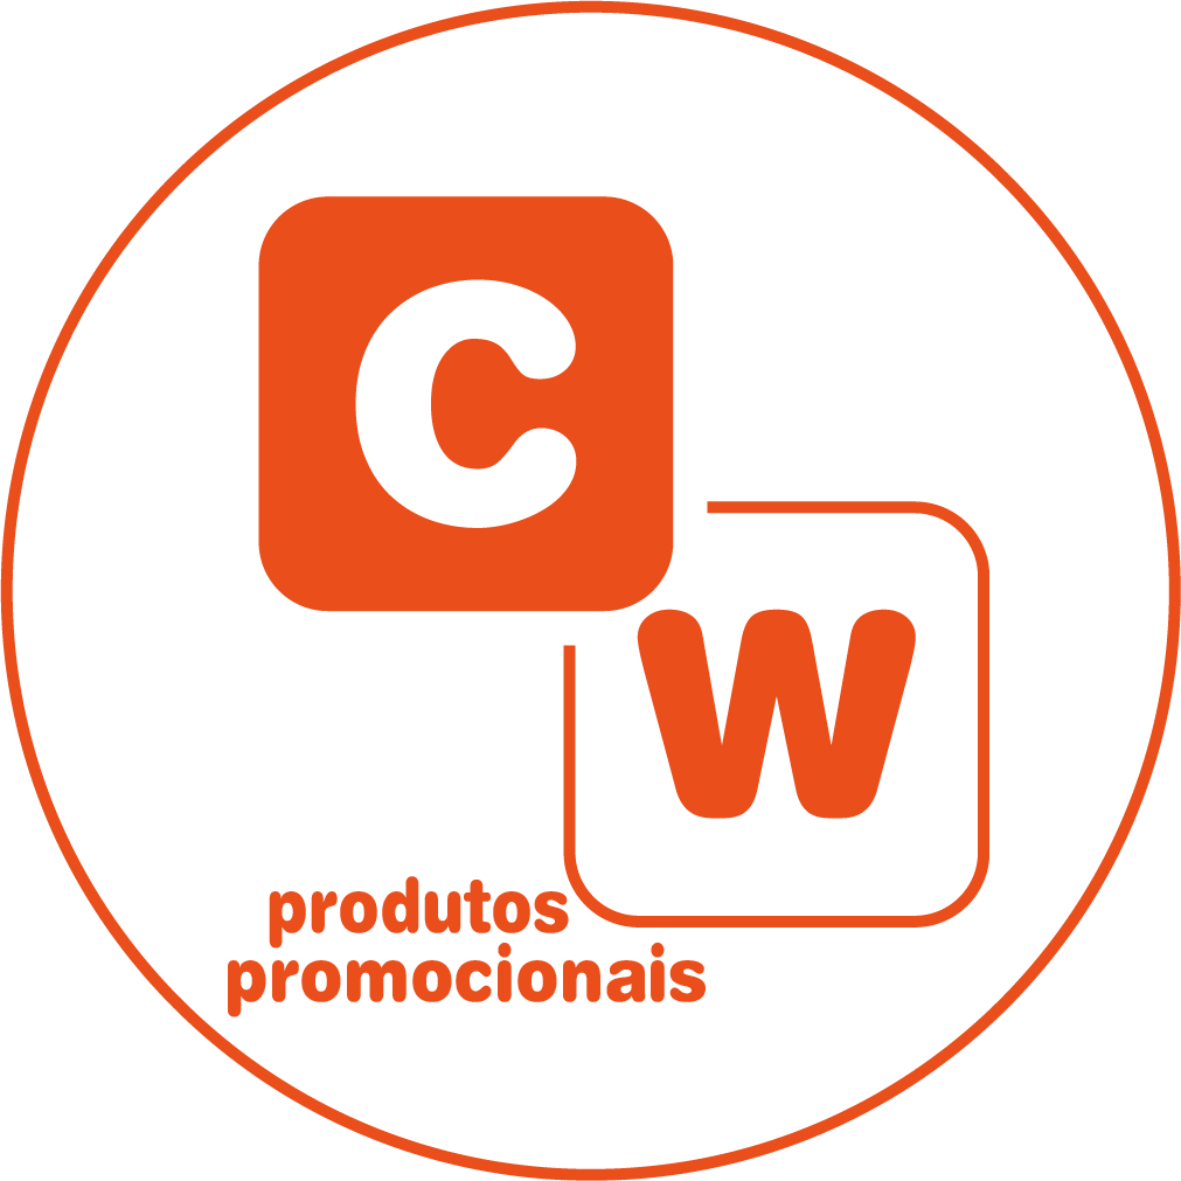 CW Produtos Promocionais